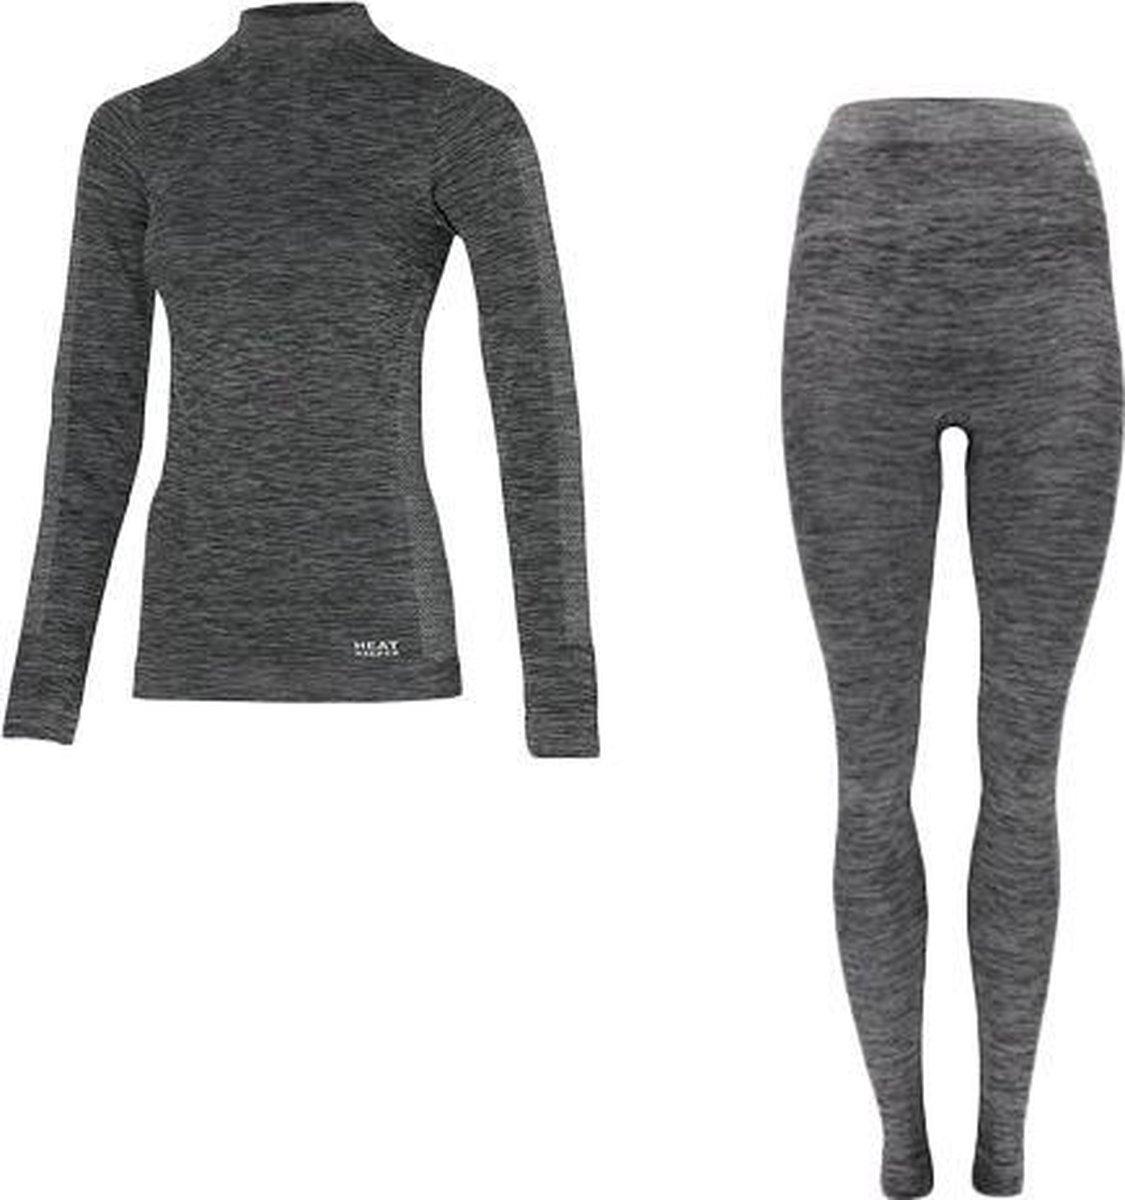 Premium thermokleding - Type: Dames, maat S - Broek en shirt - Thermoset